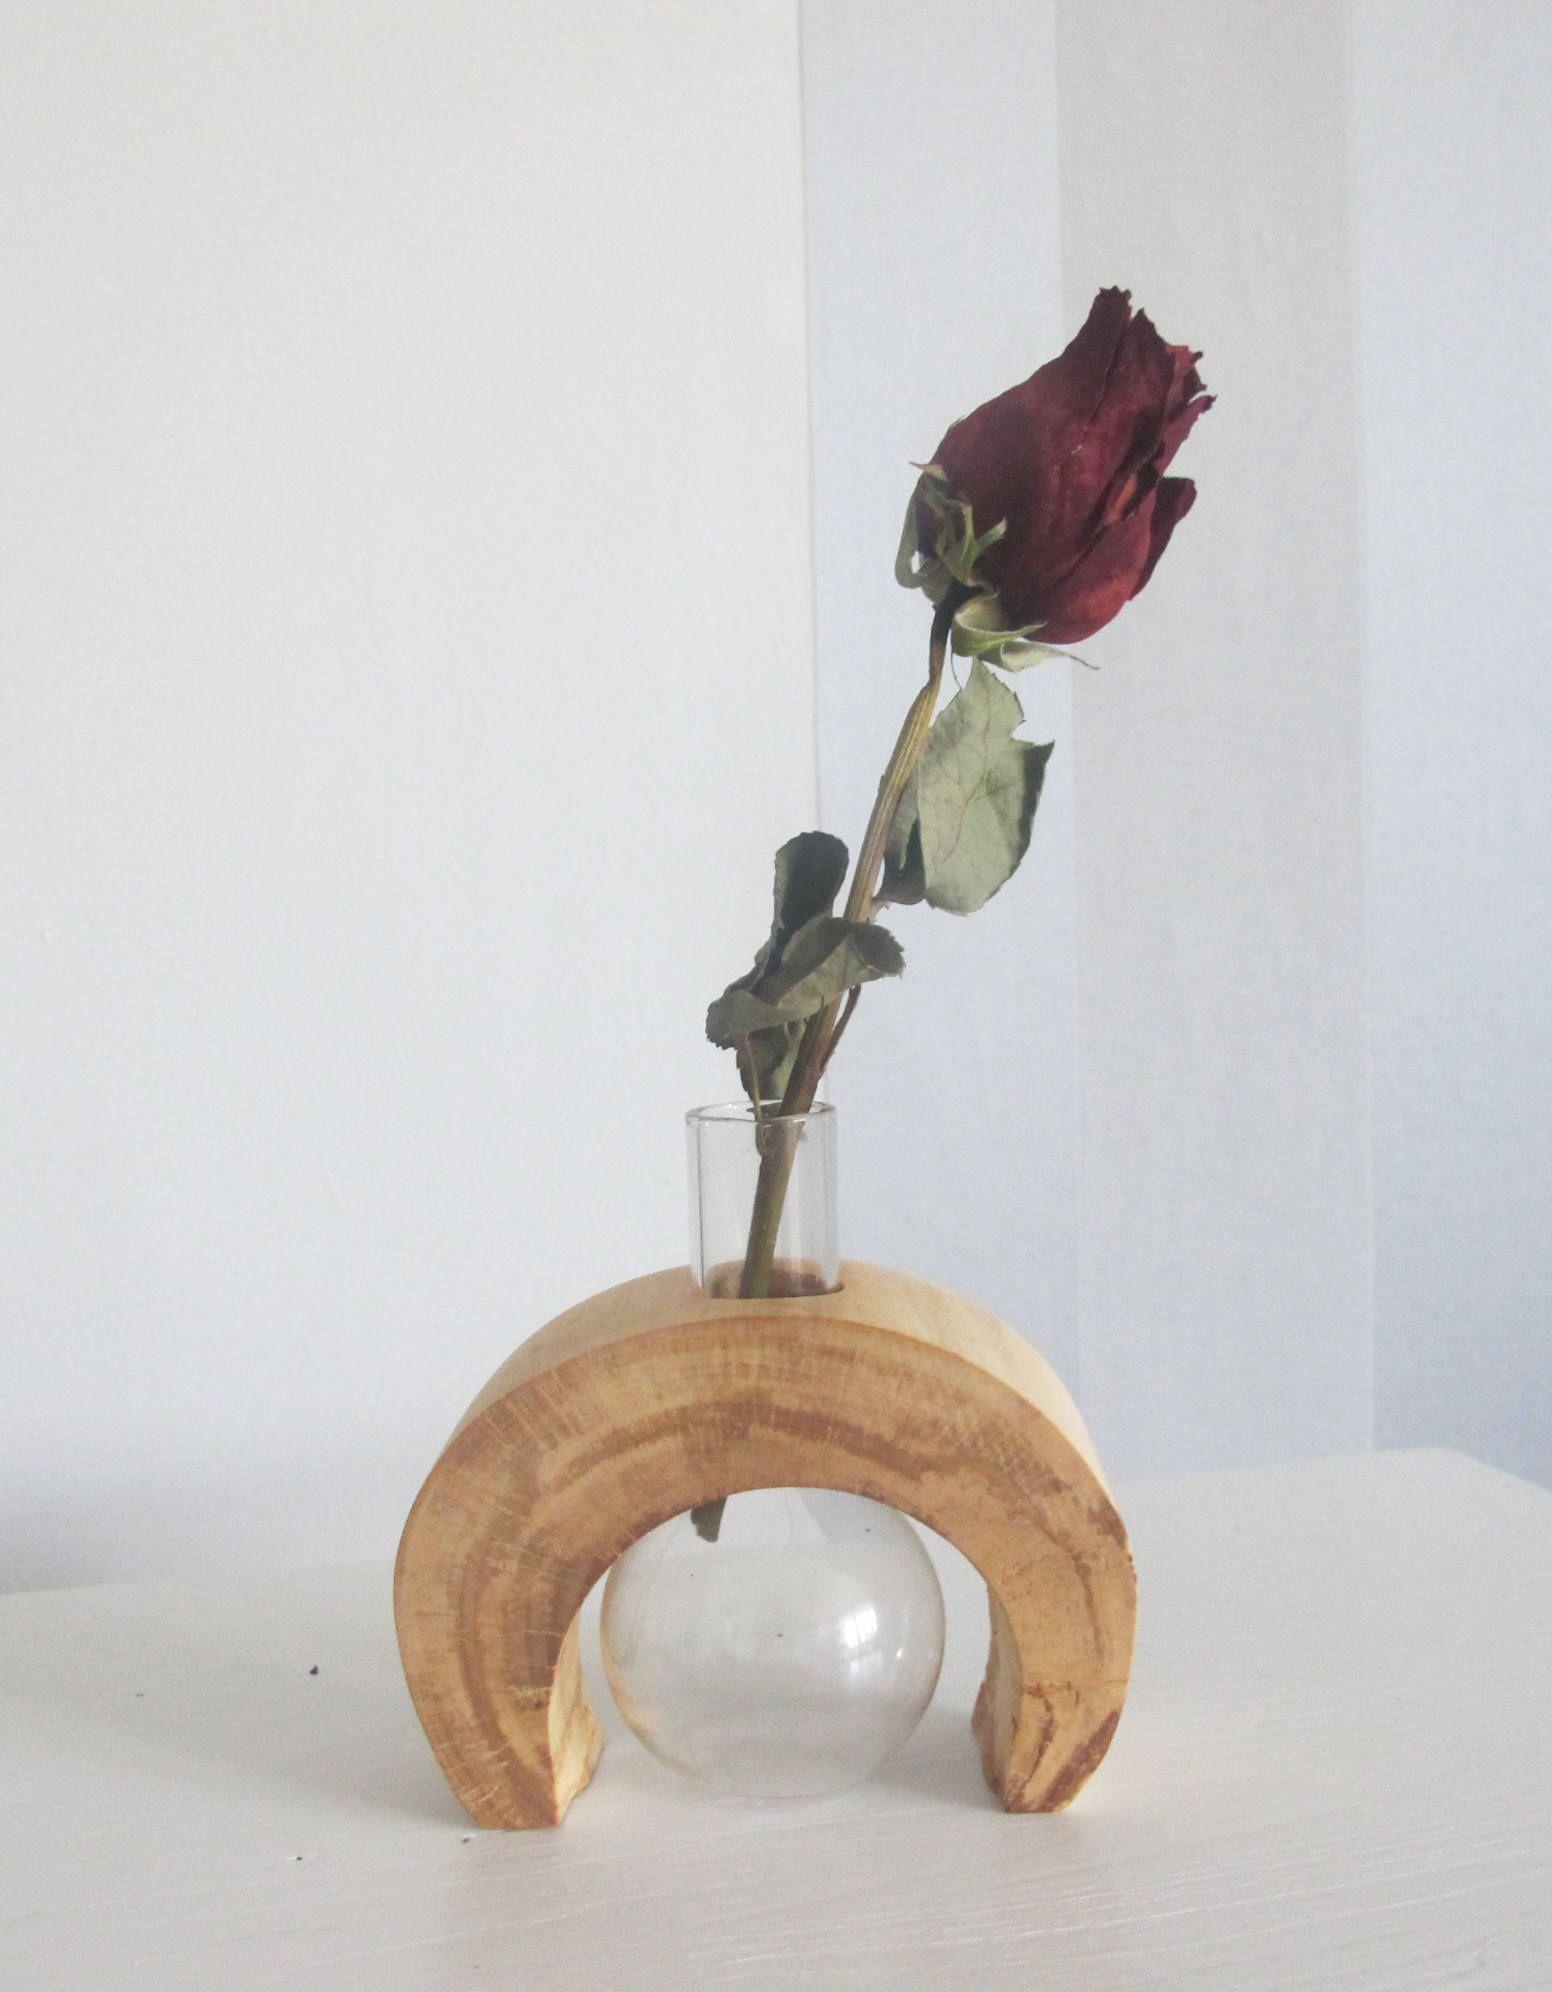 Glass Bulb Bud Vase, Small Oak Wood Vase, Wooden Vase By Vishemir On Etsy Ideas